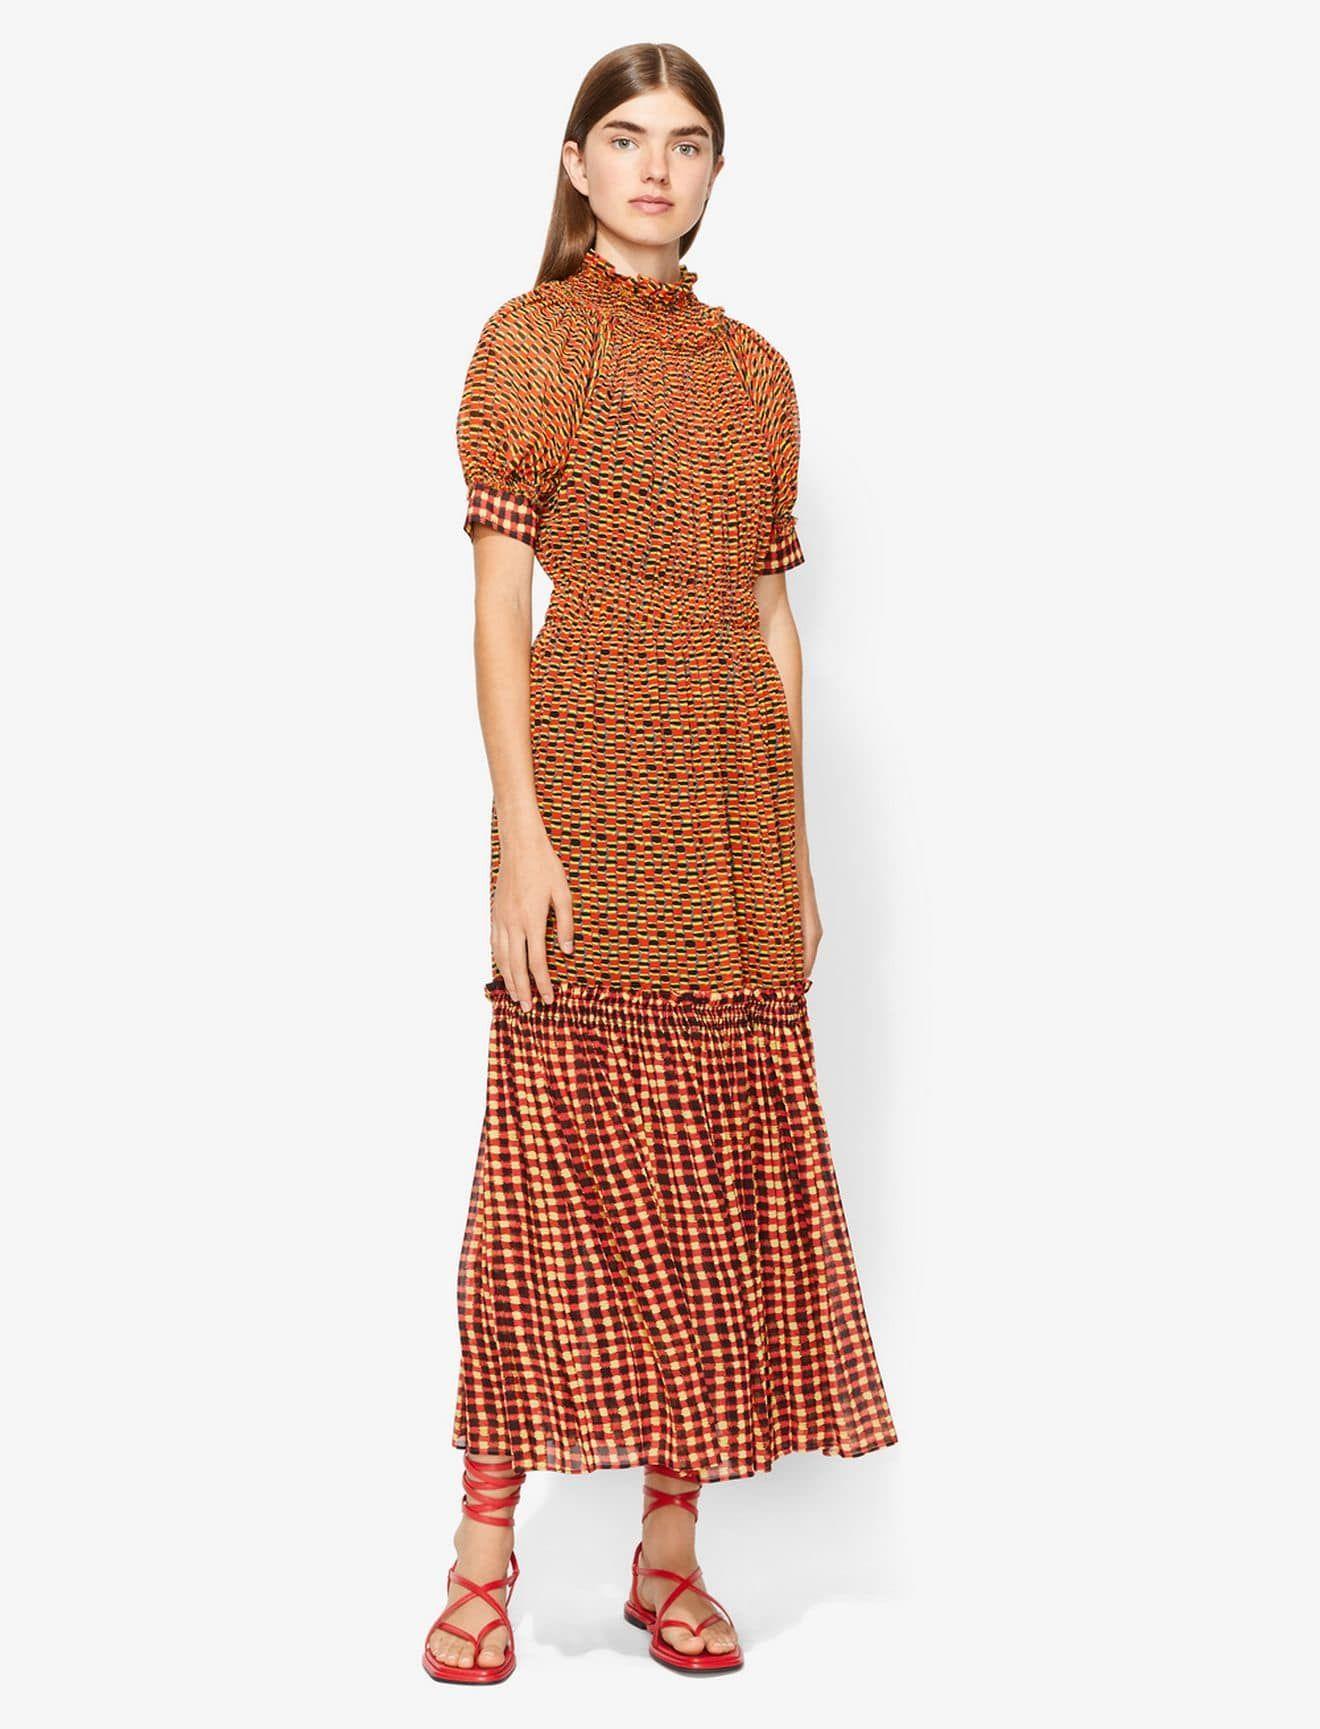 3ebc9d4878a Crepe Chiffon Tiered Dress | Clothing | Tiered dress, Dresses, Chiffon